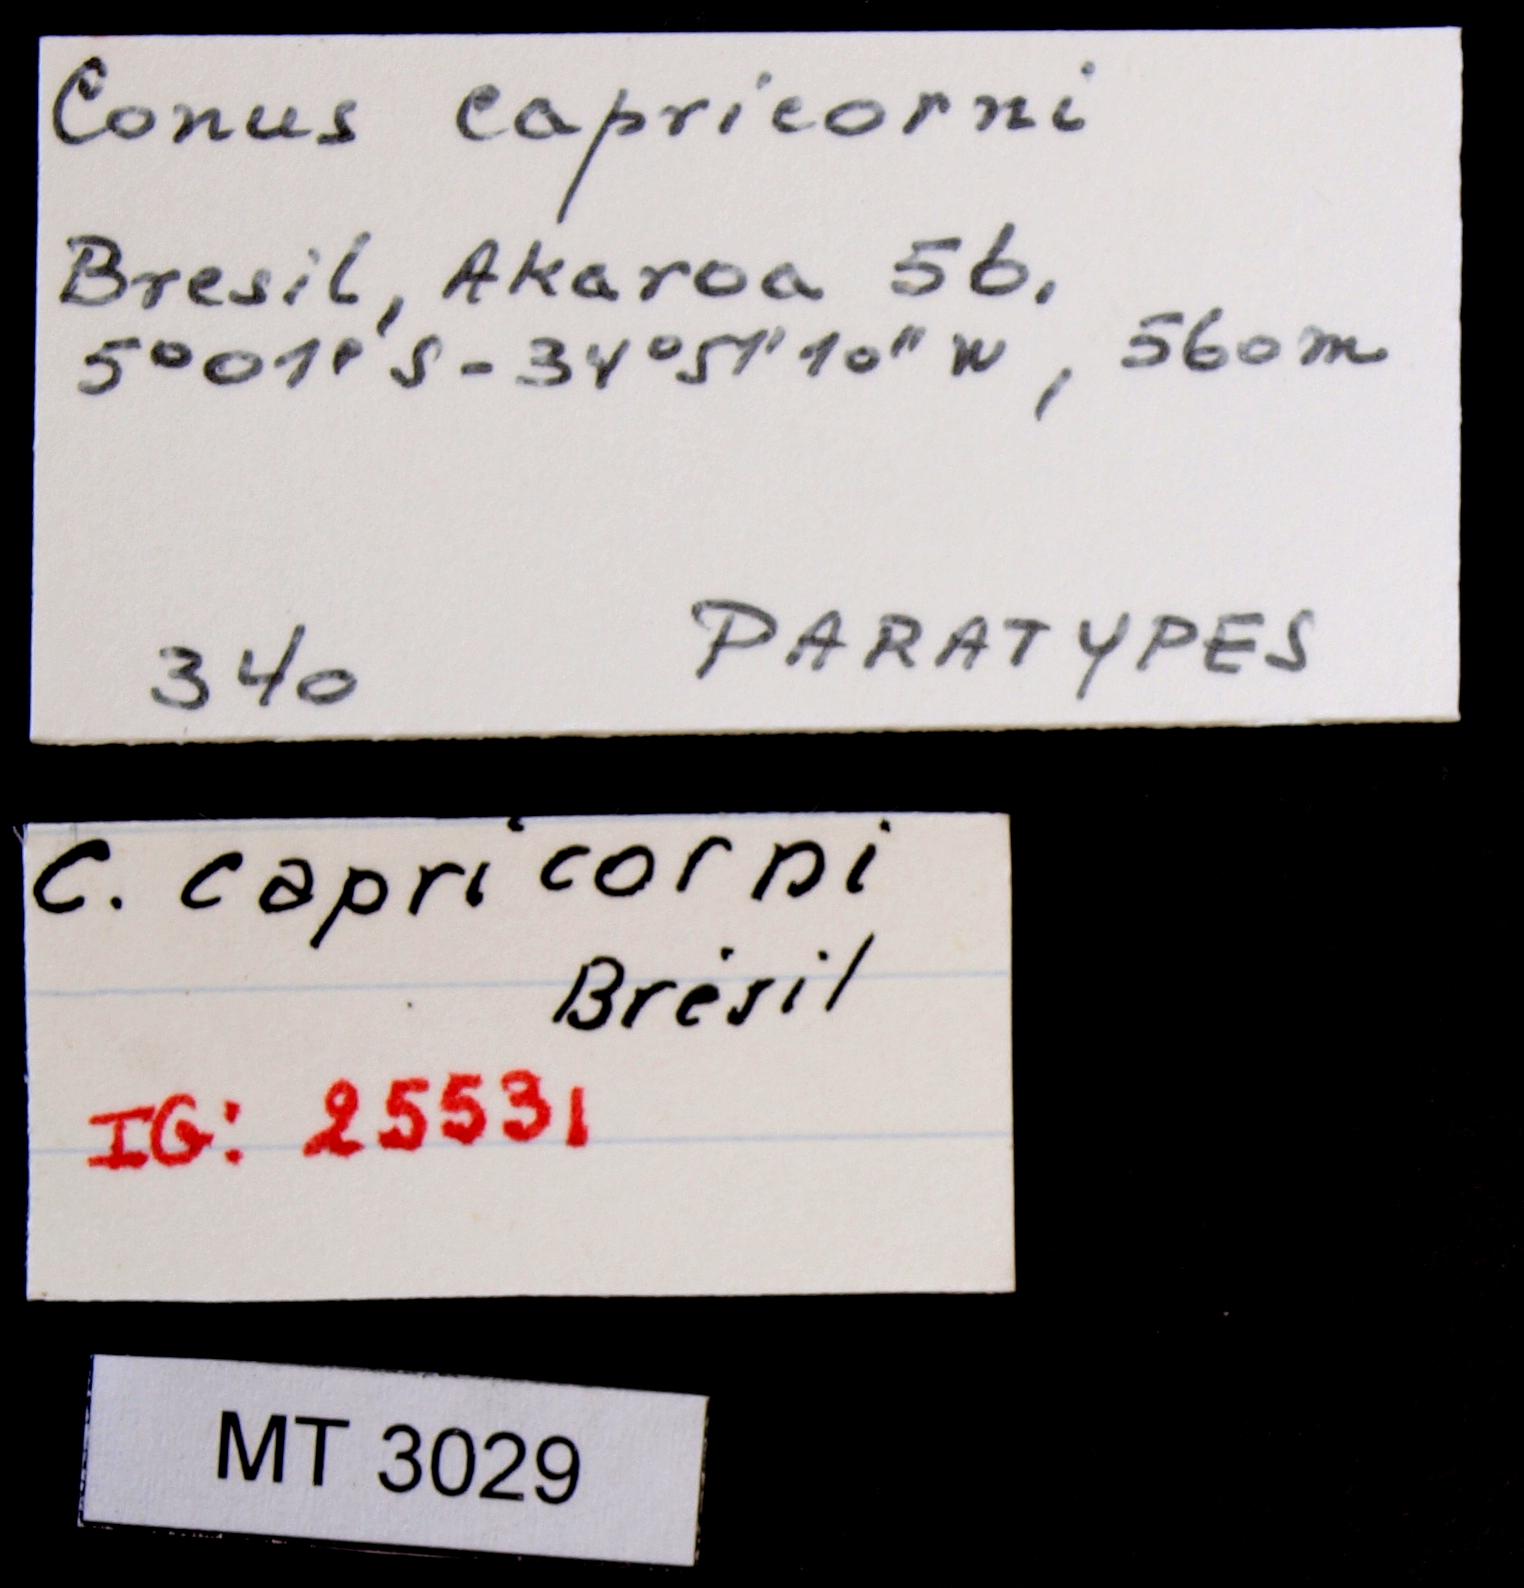 BE-RBINS-INV MT.3029 Conus capricorni Pt Lb.JPG